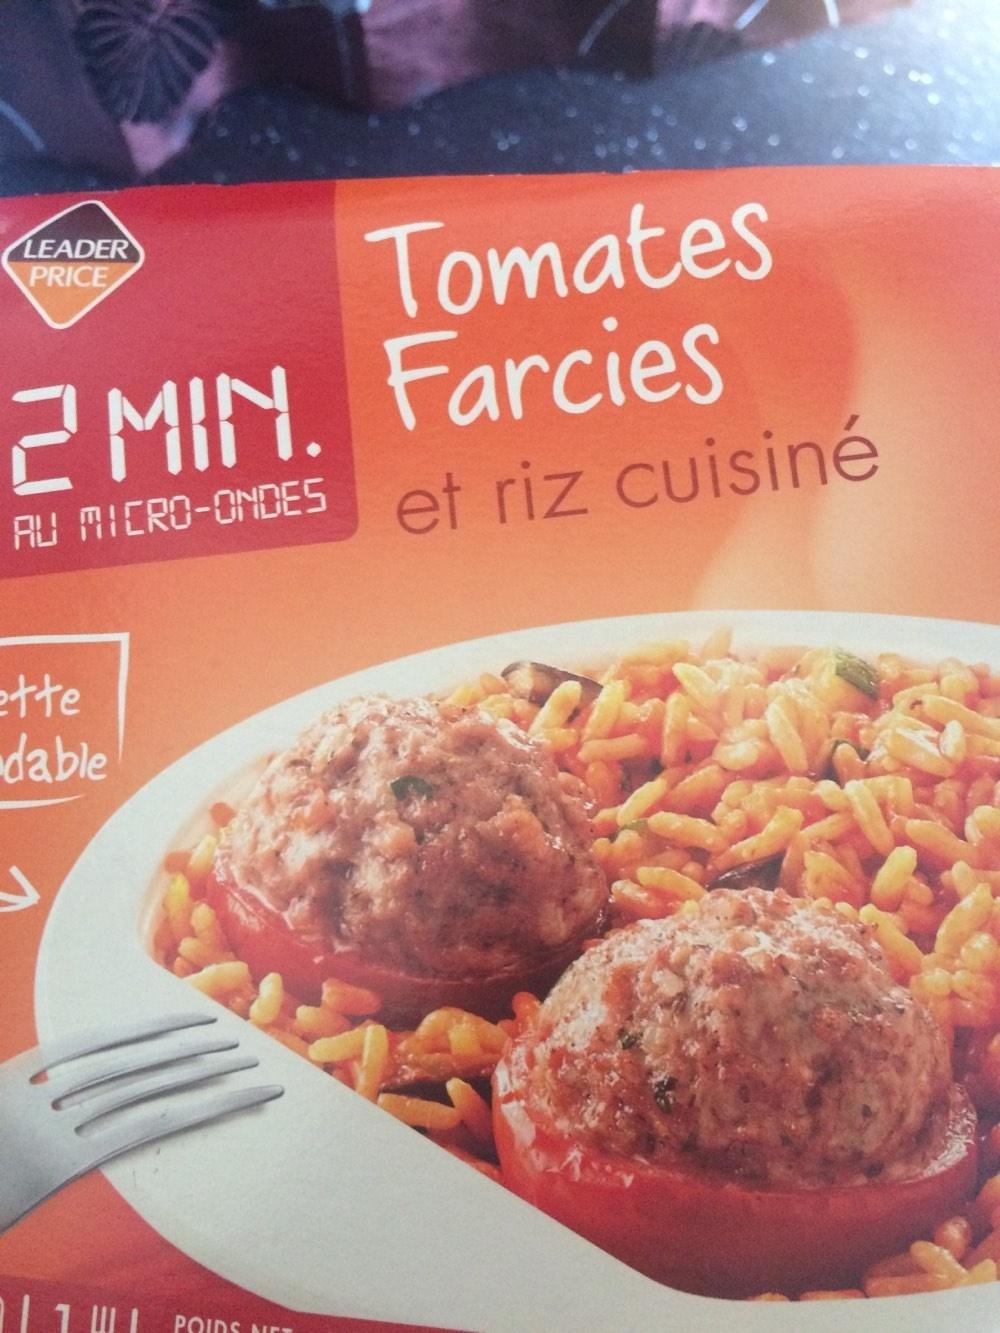 tomates farcies et riz cuisin leader price 300 g. Black Bedroom Furniture Sets. Home Design Ideas